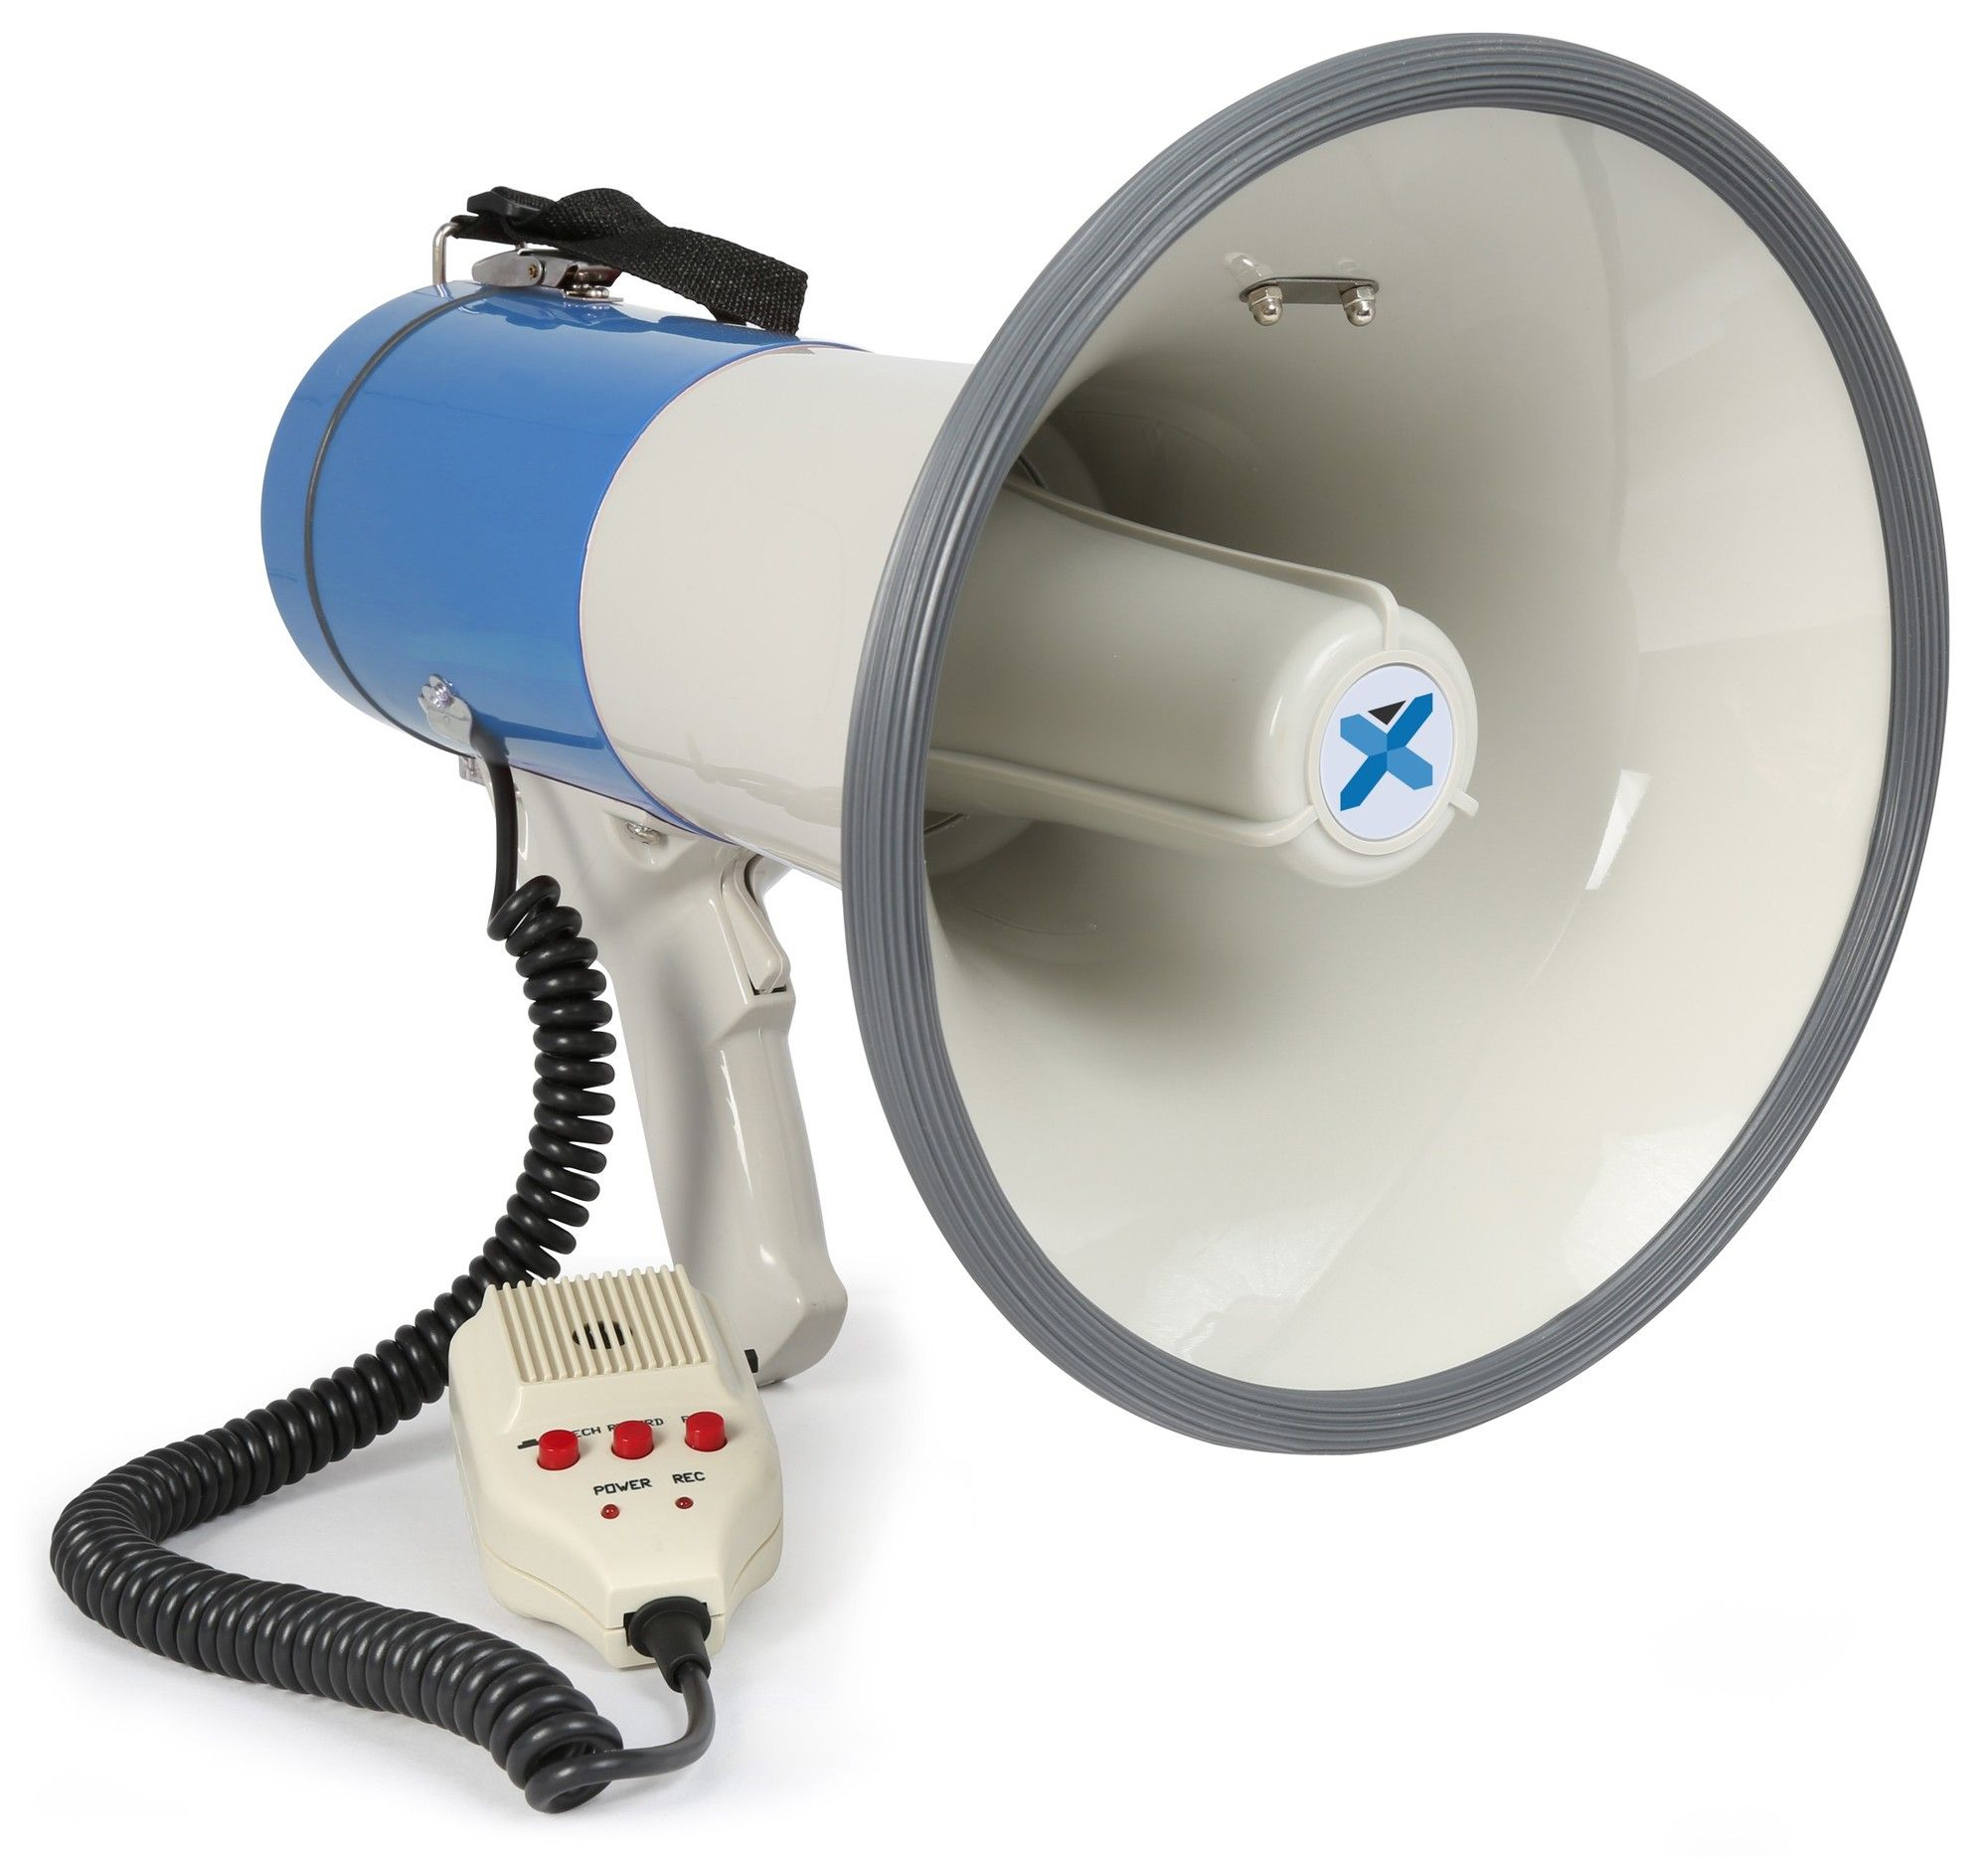 Vexus MEG060 60W megafoon met sirene en USB-SD